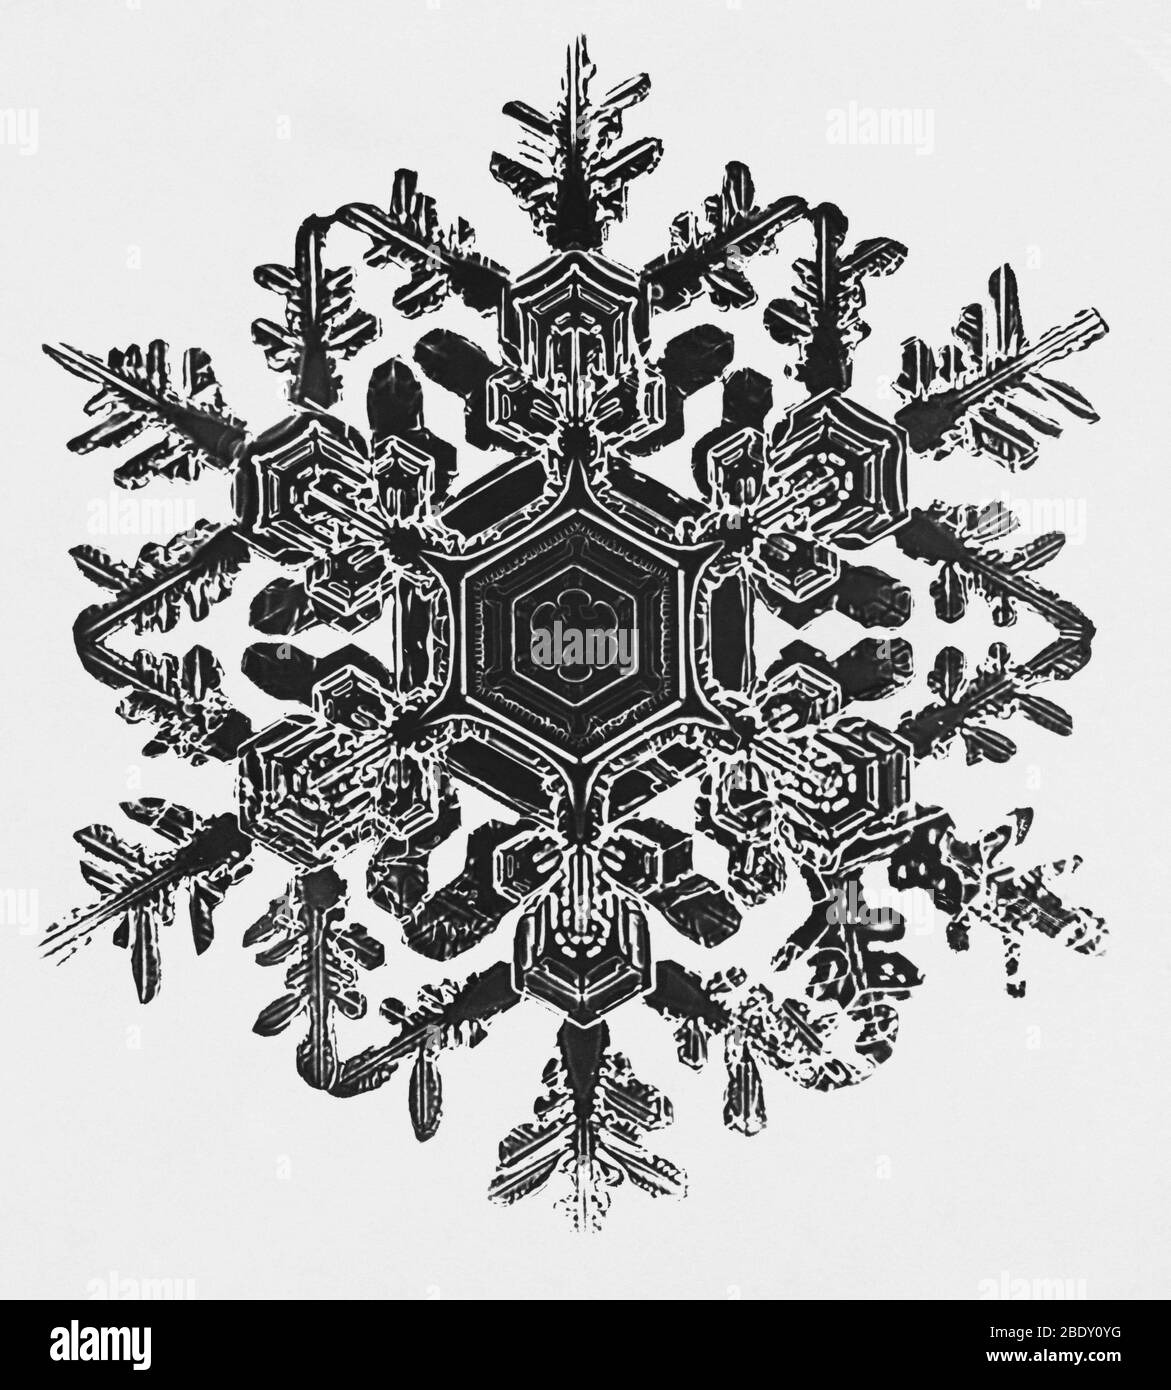 Copo de nieve Foto de stock